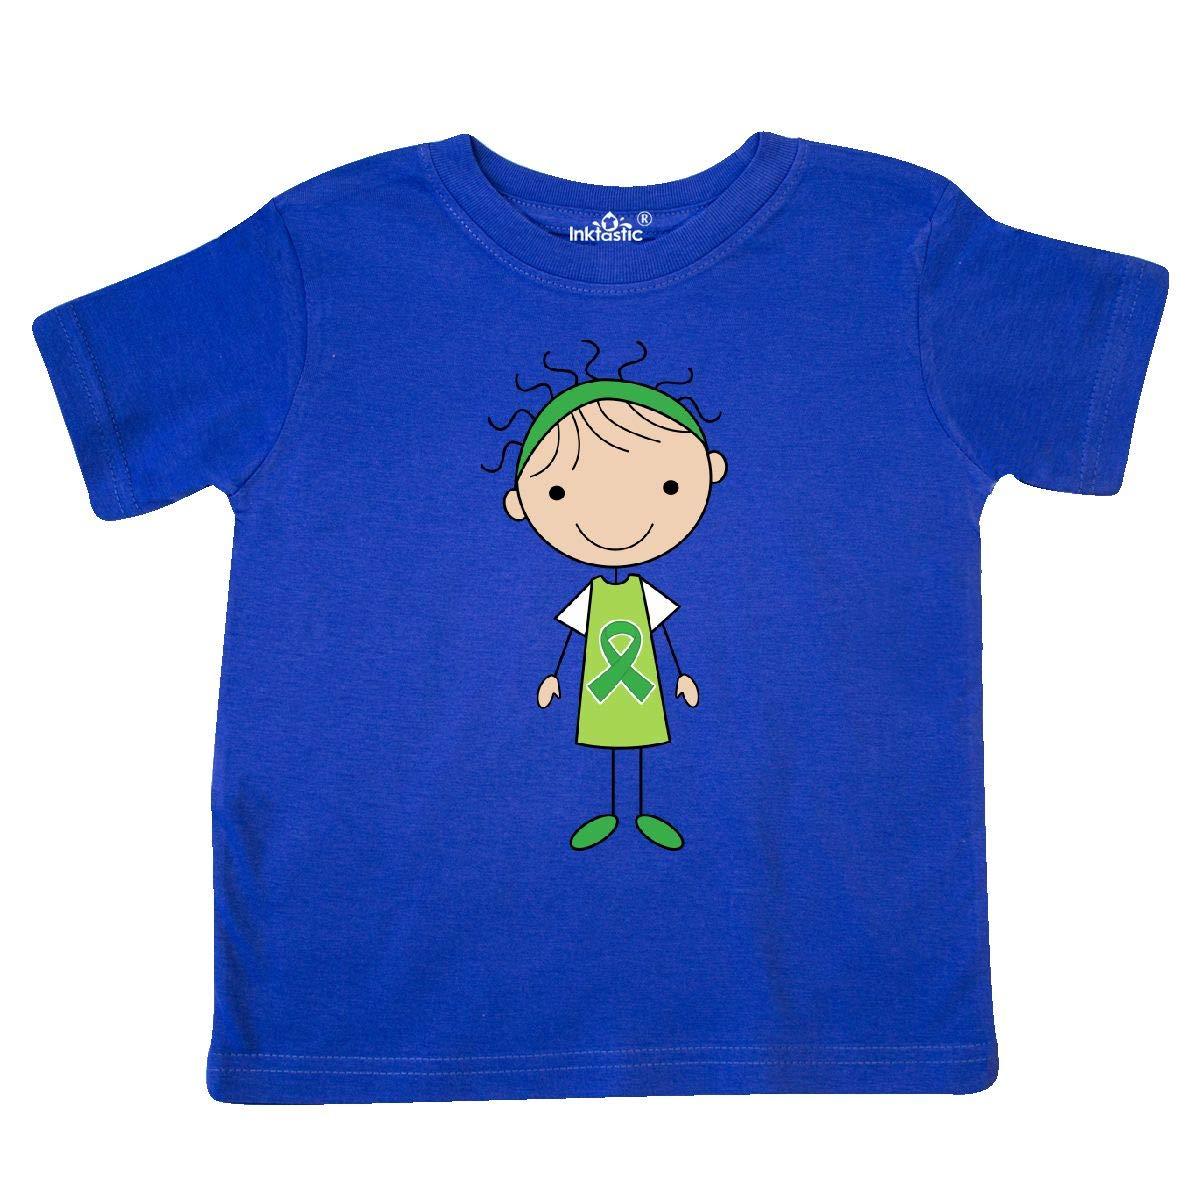 inktastic Awareness Green Ribbon Girl Toddler T-Shirt